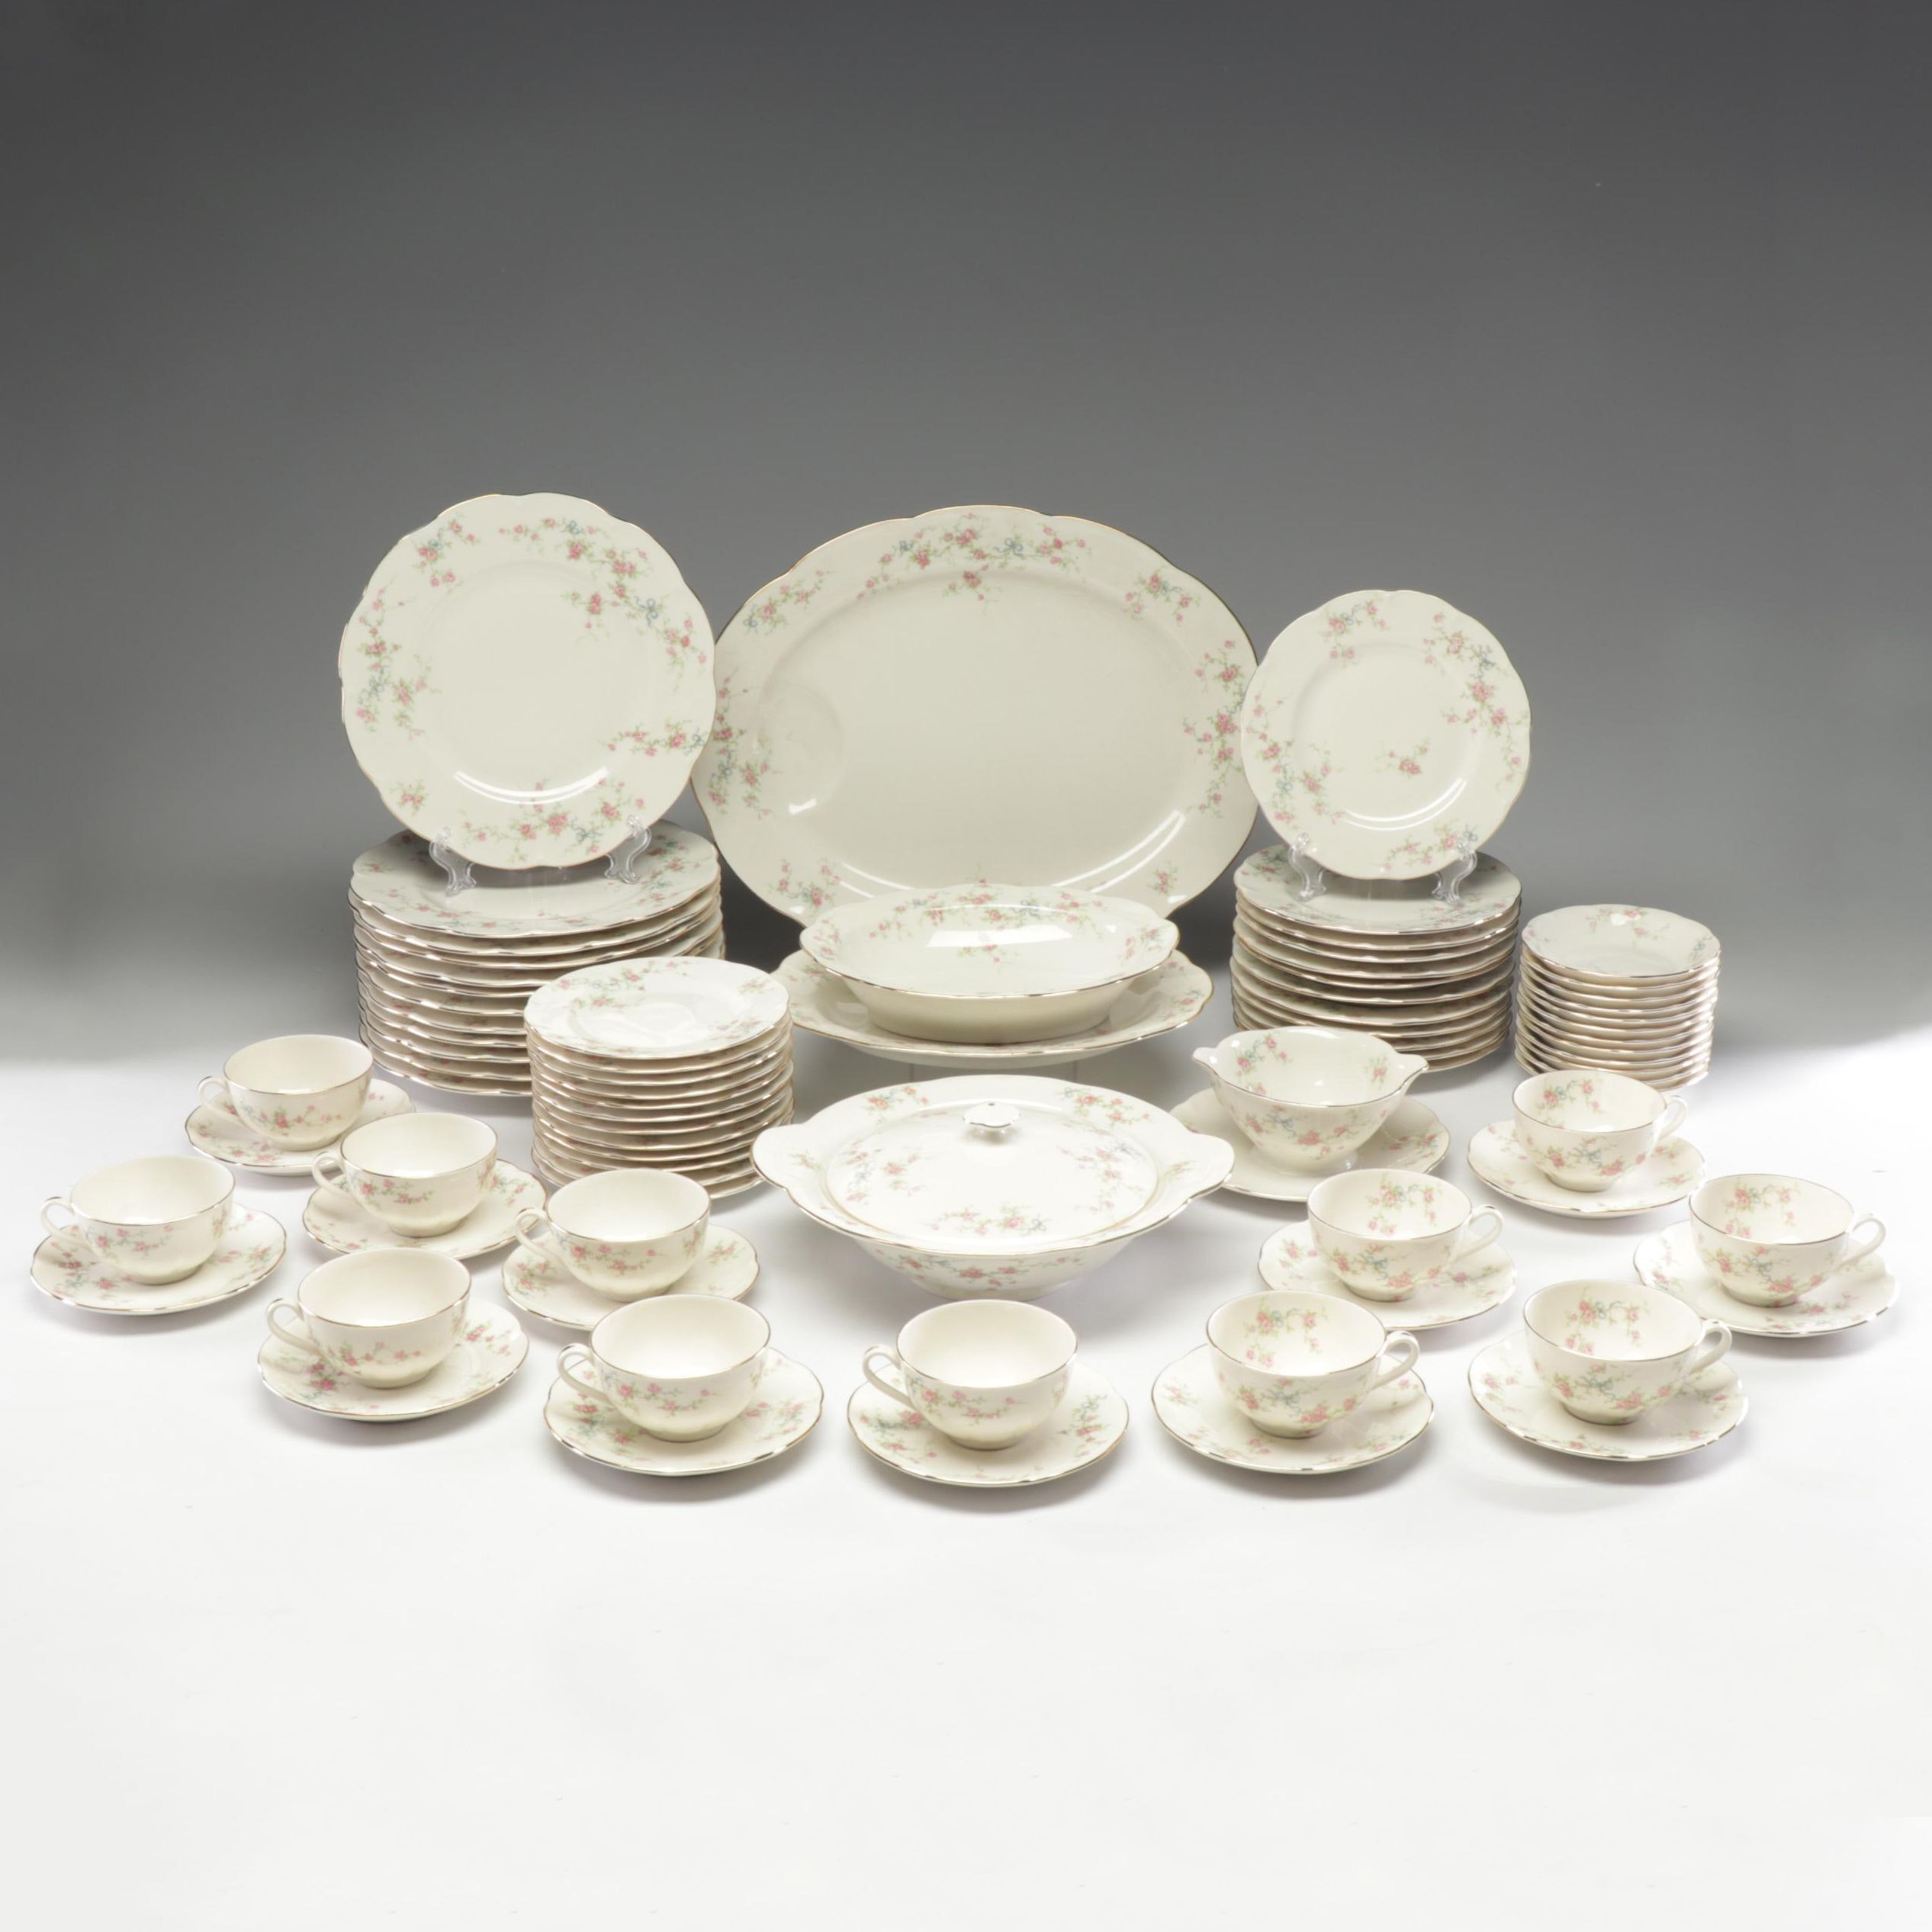 "Theodore Haviland ""Rosanne"" Porcelain Dinnerware Set"